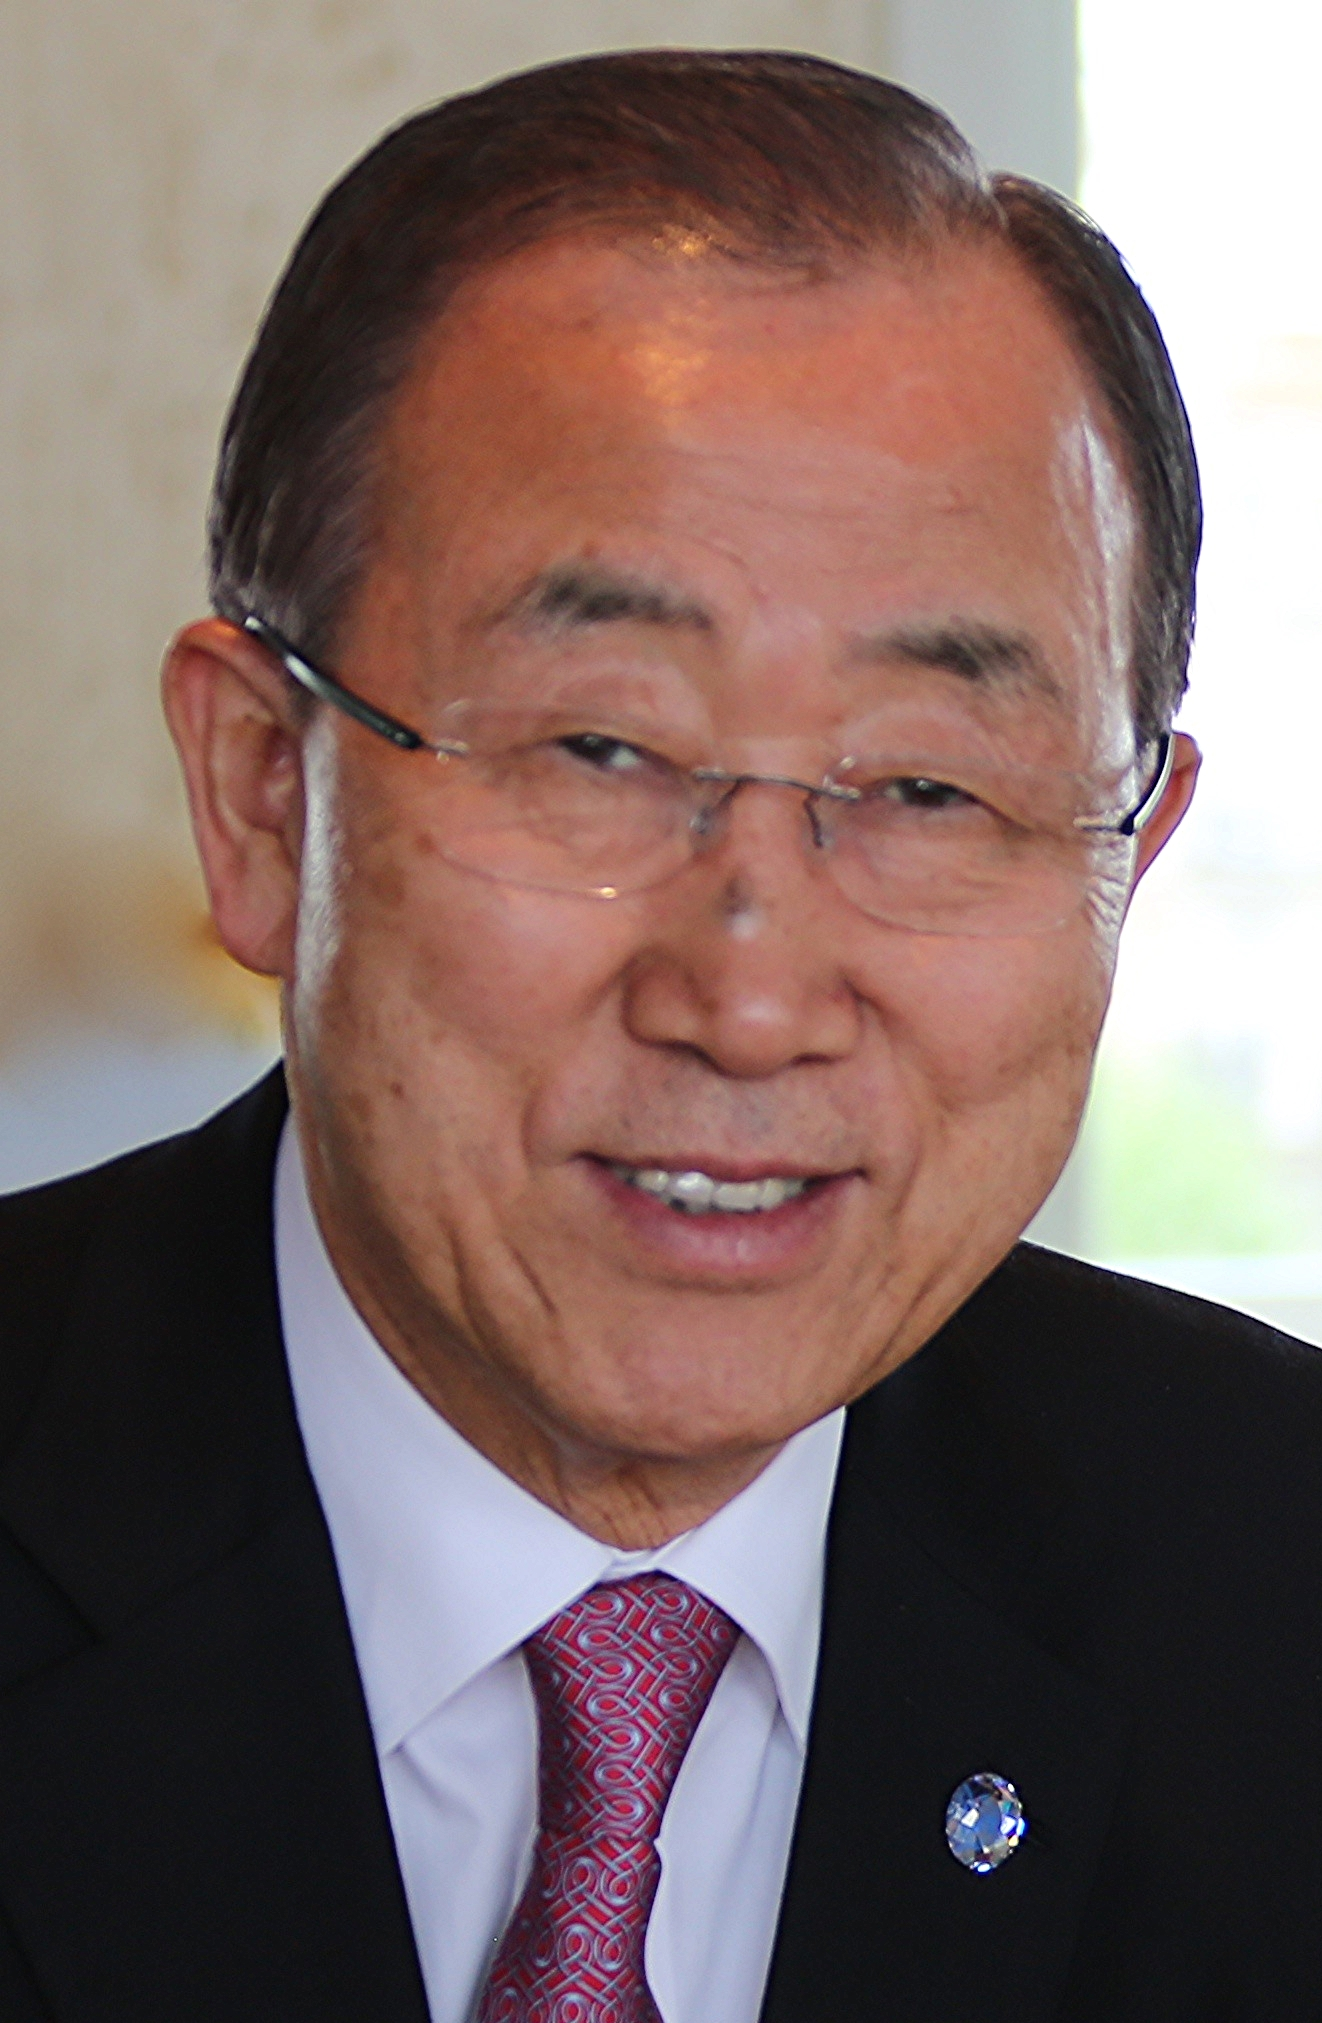 File:Ban Ki-moon April 2015.jpg - Wikimedia Commons